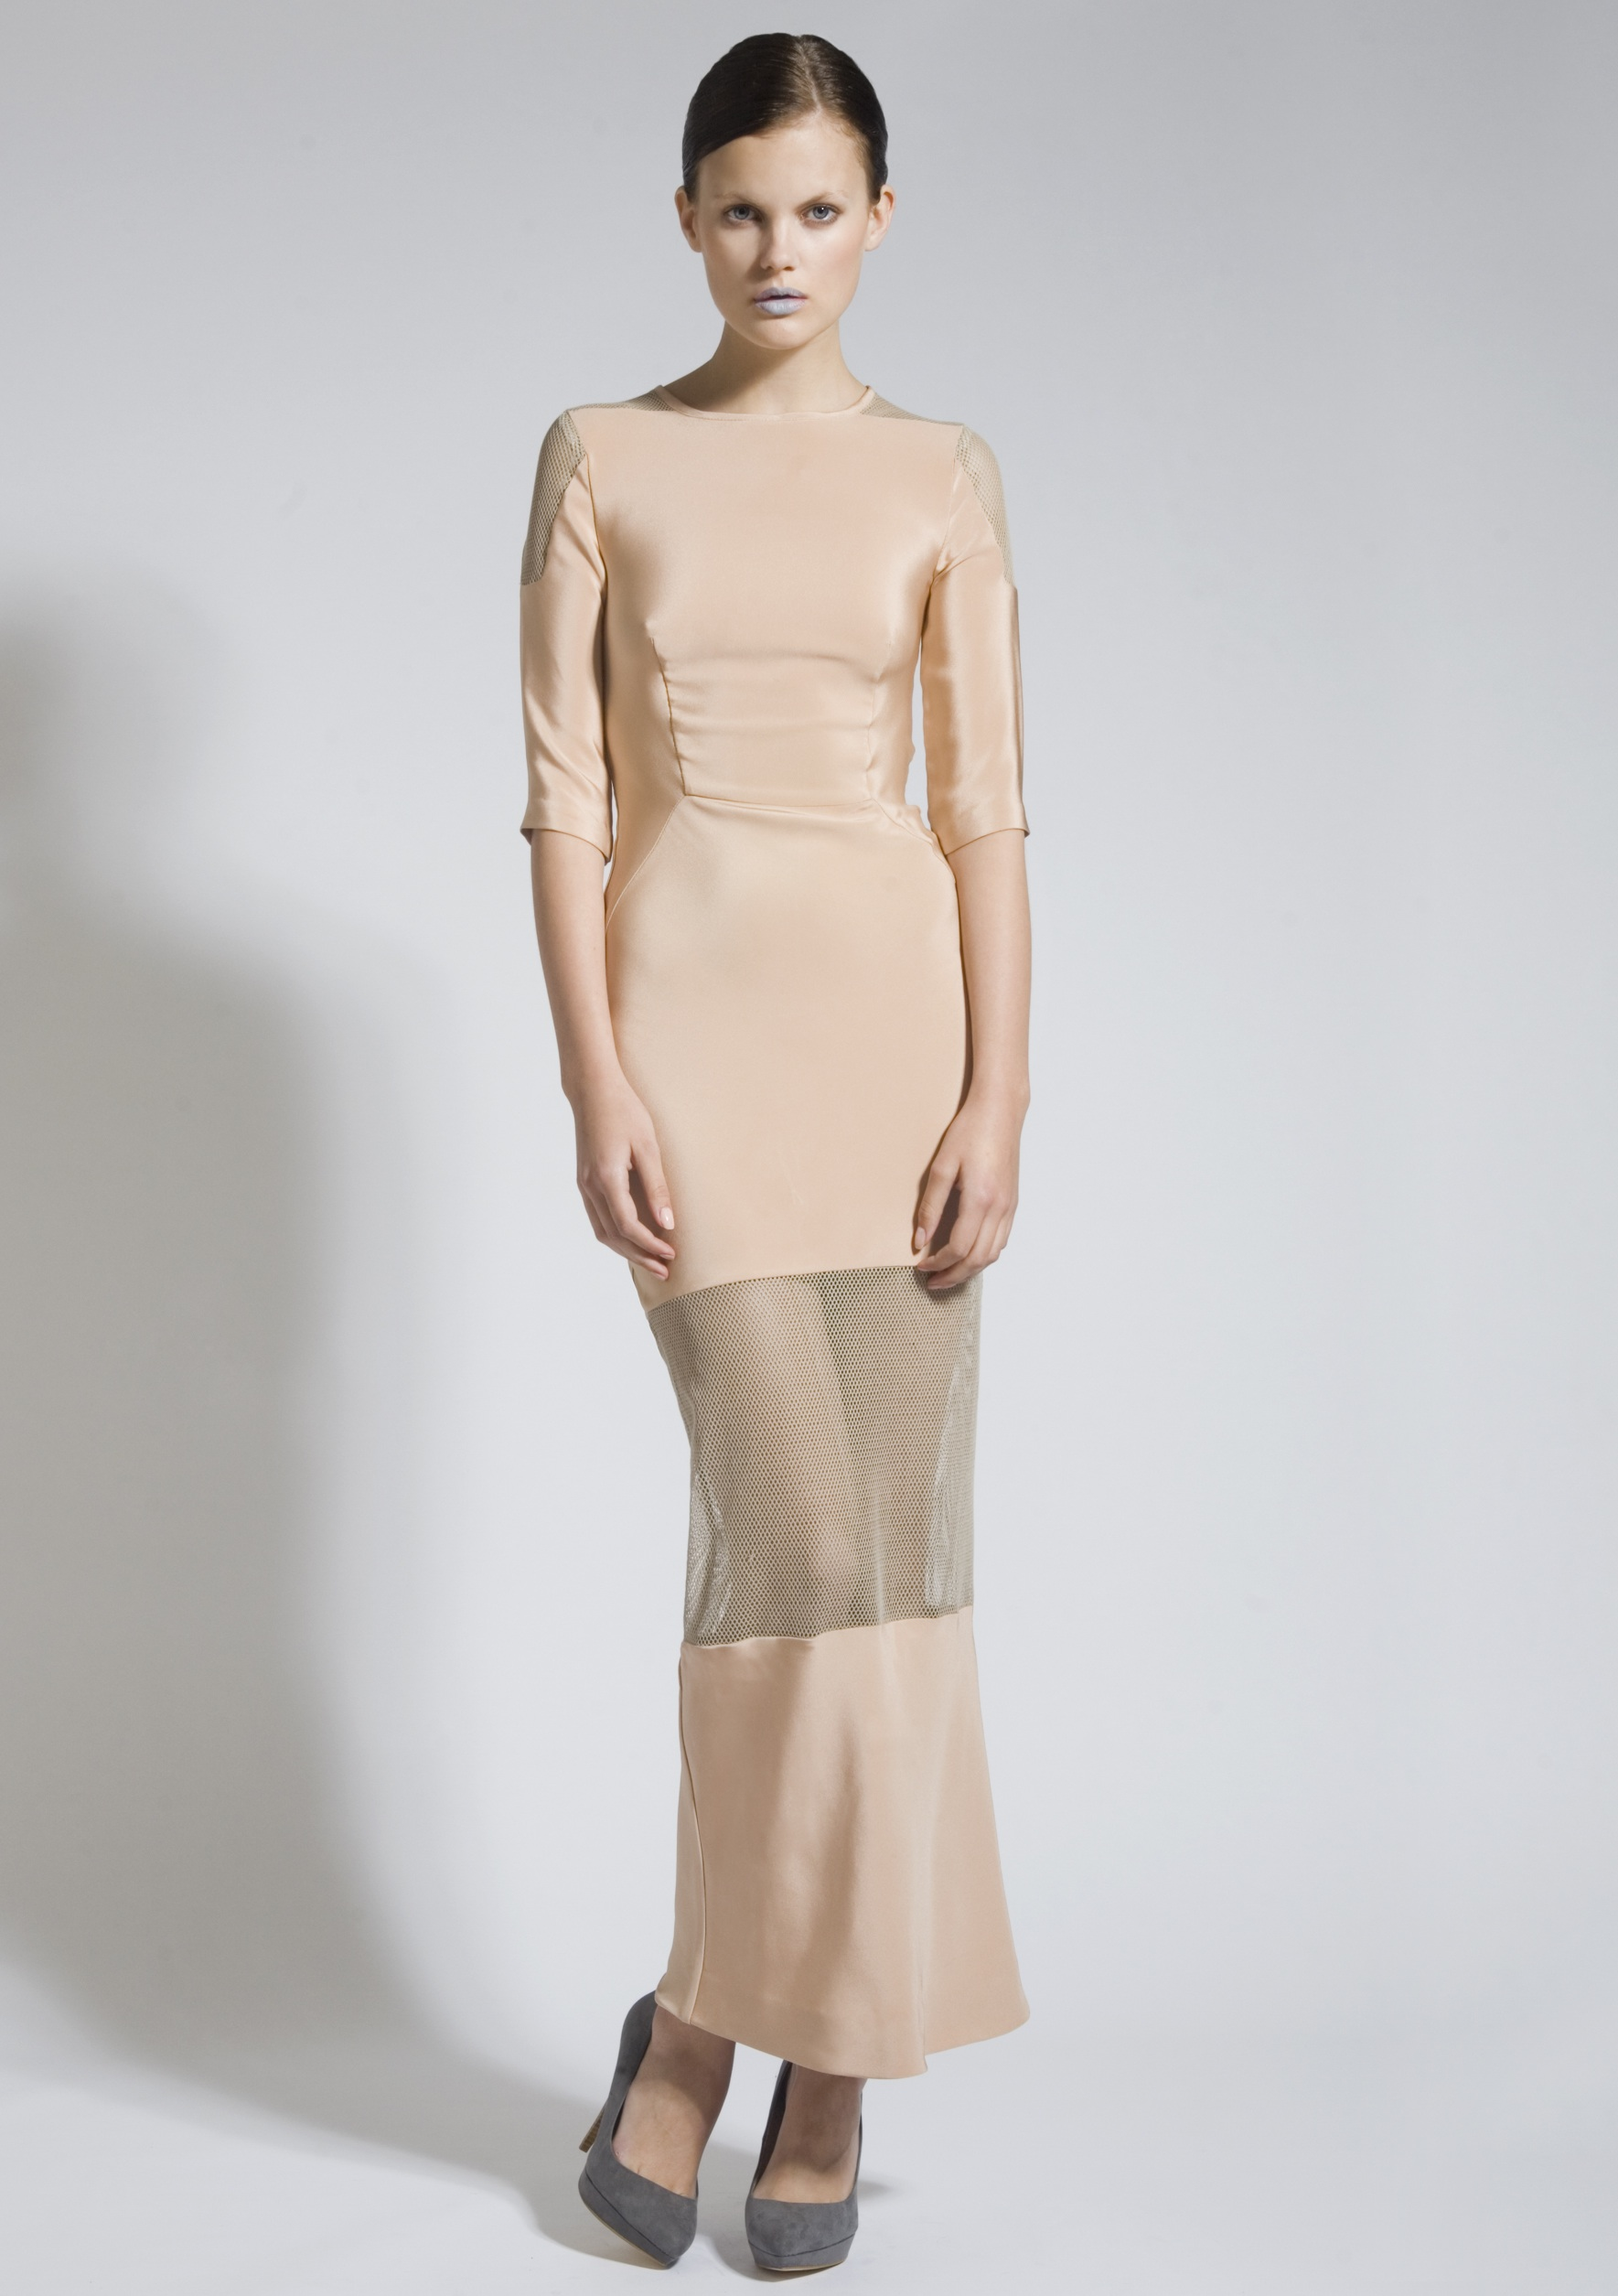 7 Nude Silk Dress with Net Inserts.jpg